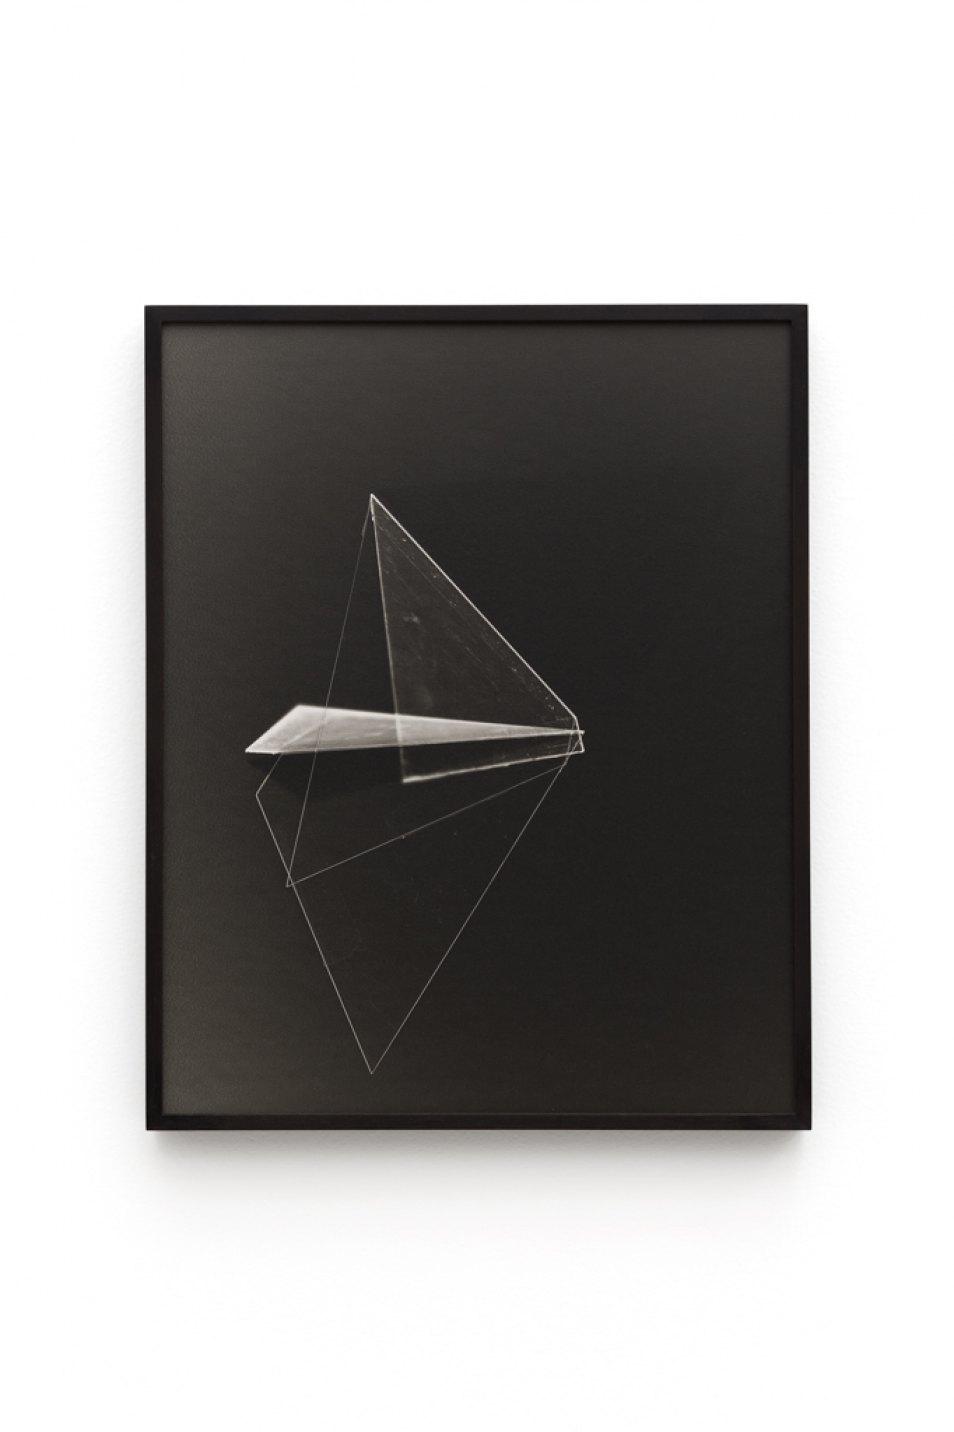 Leticia Ramos,&nbsp;<em>BICHOS</em>,&nbsp;2017,&nbsp;silver print and photogram,&nbsp;40 × 50 cm - Mendes Wood DM